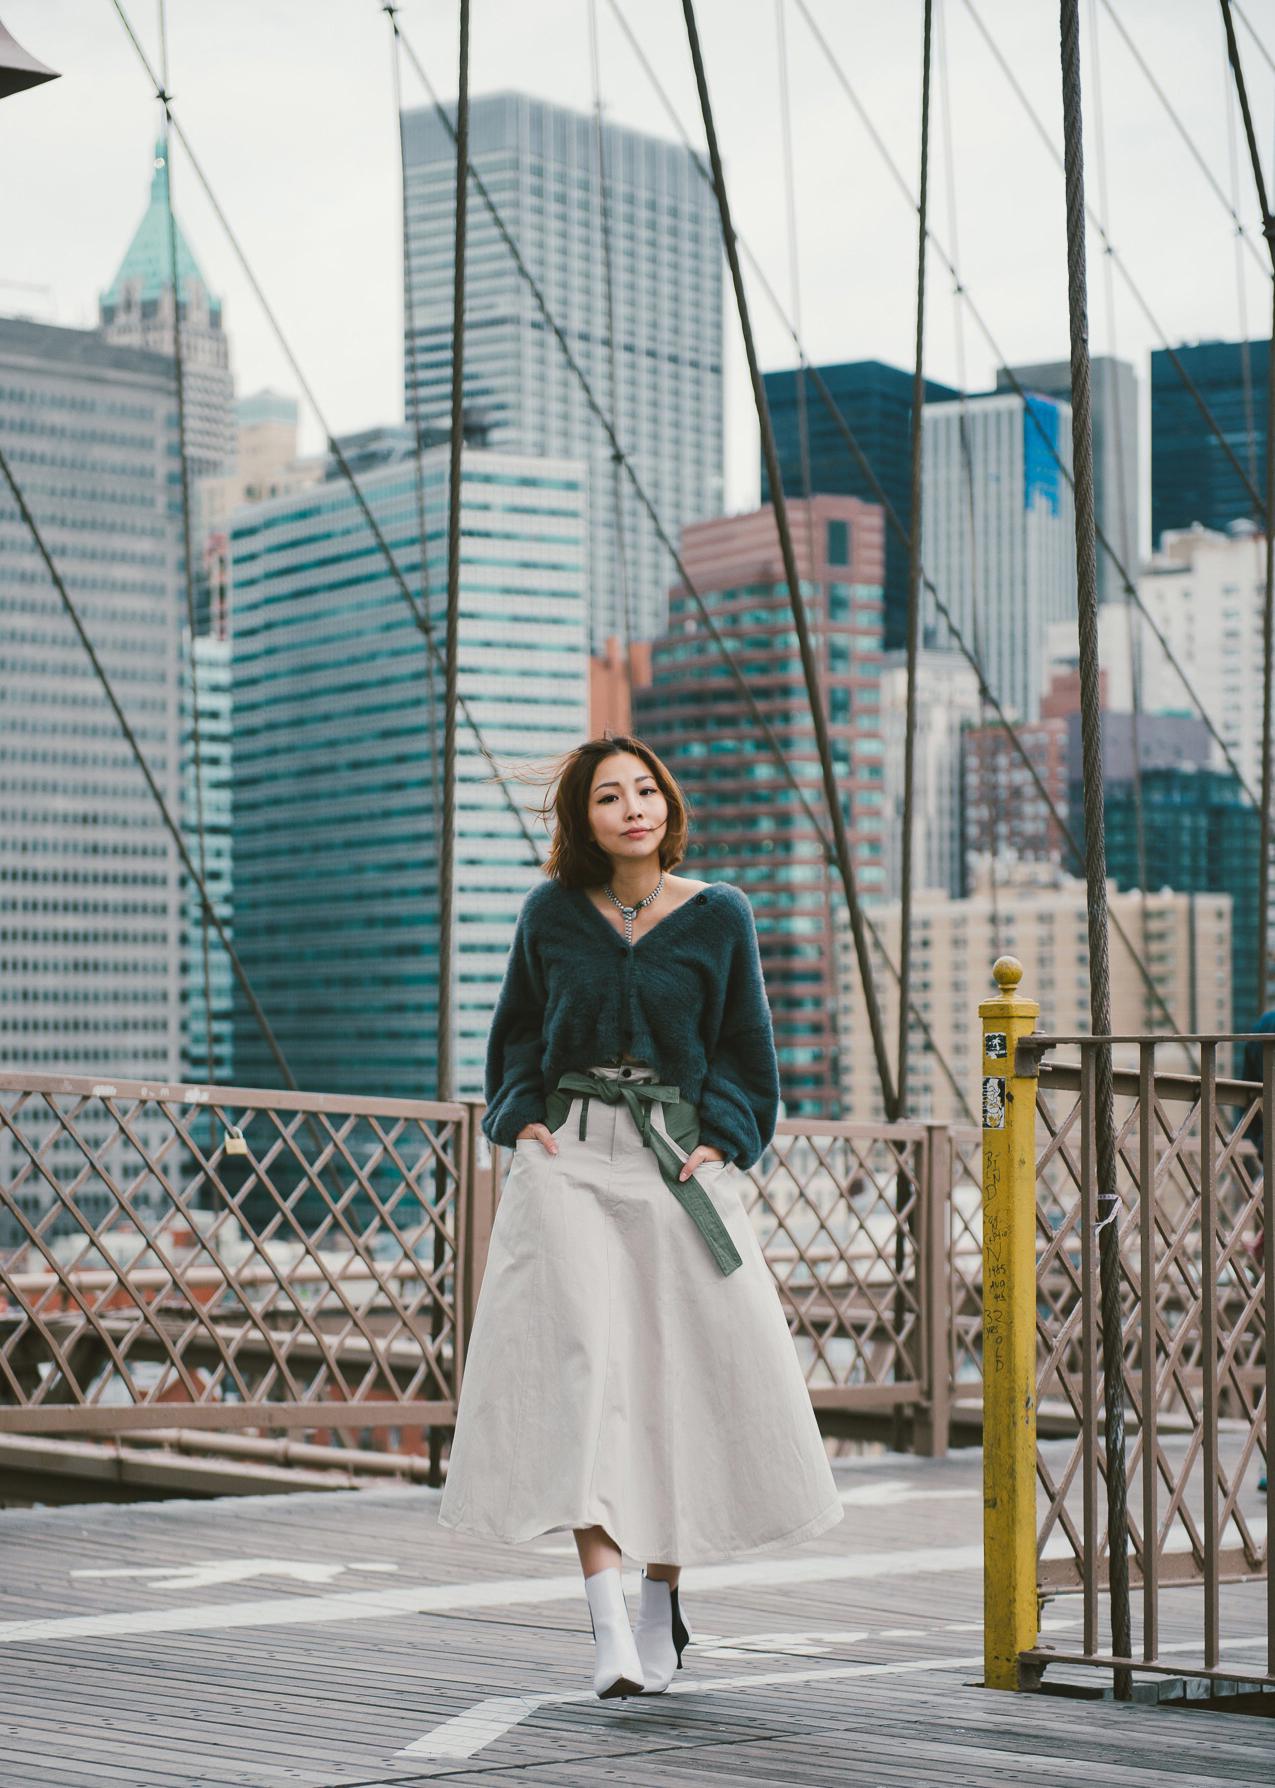 nyc lifestyle blogger.JPG